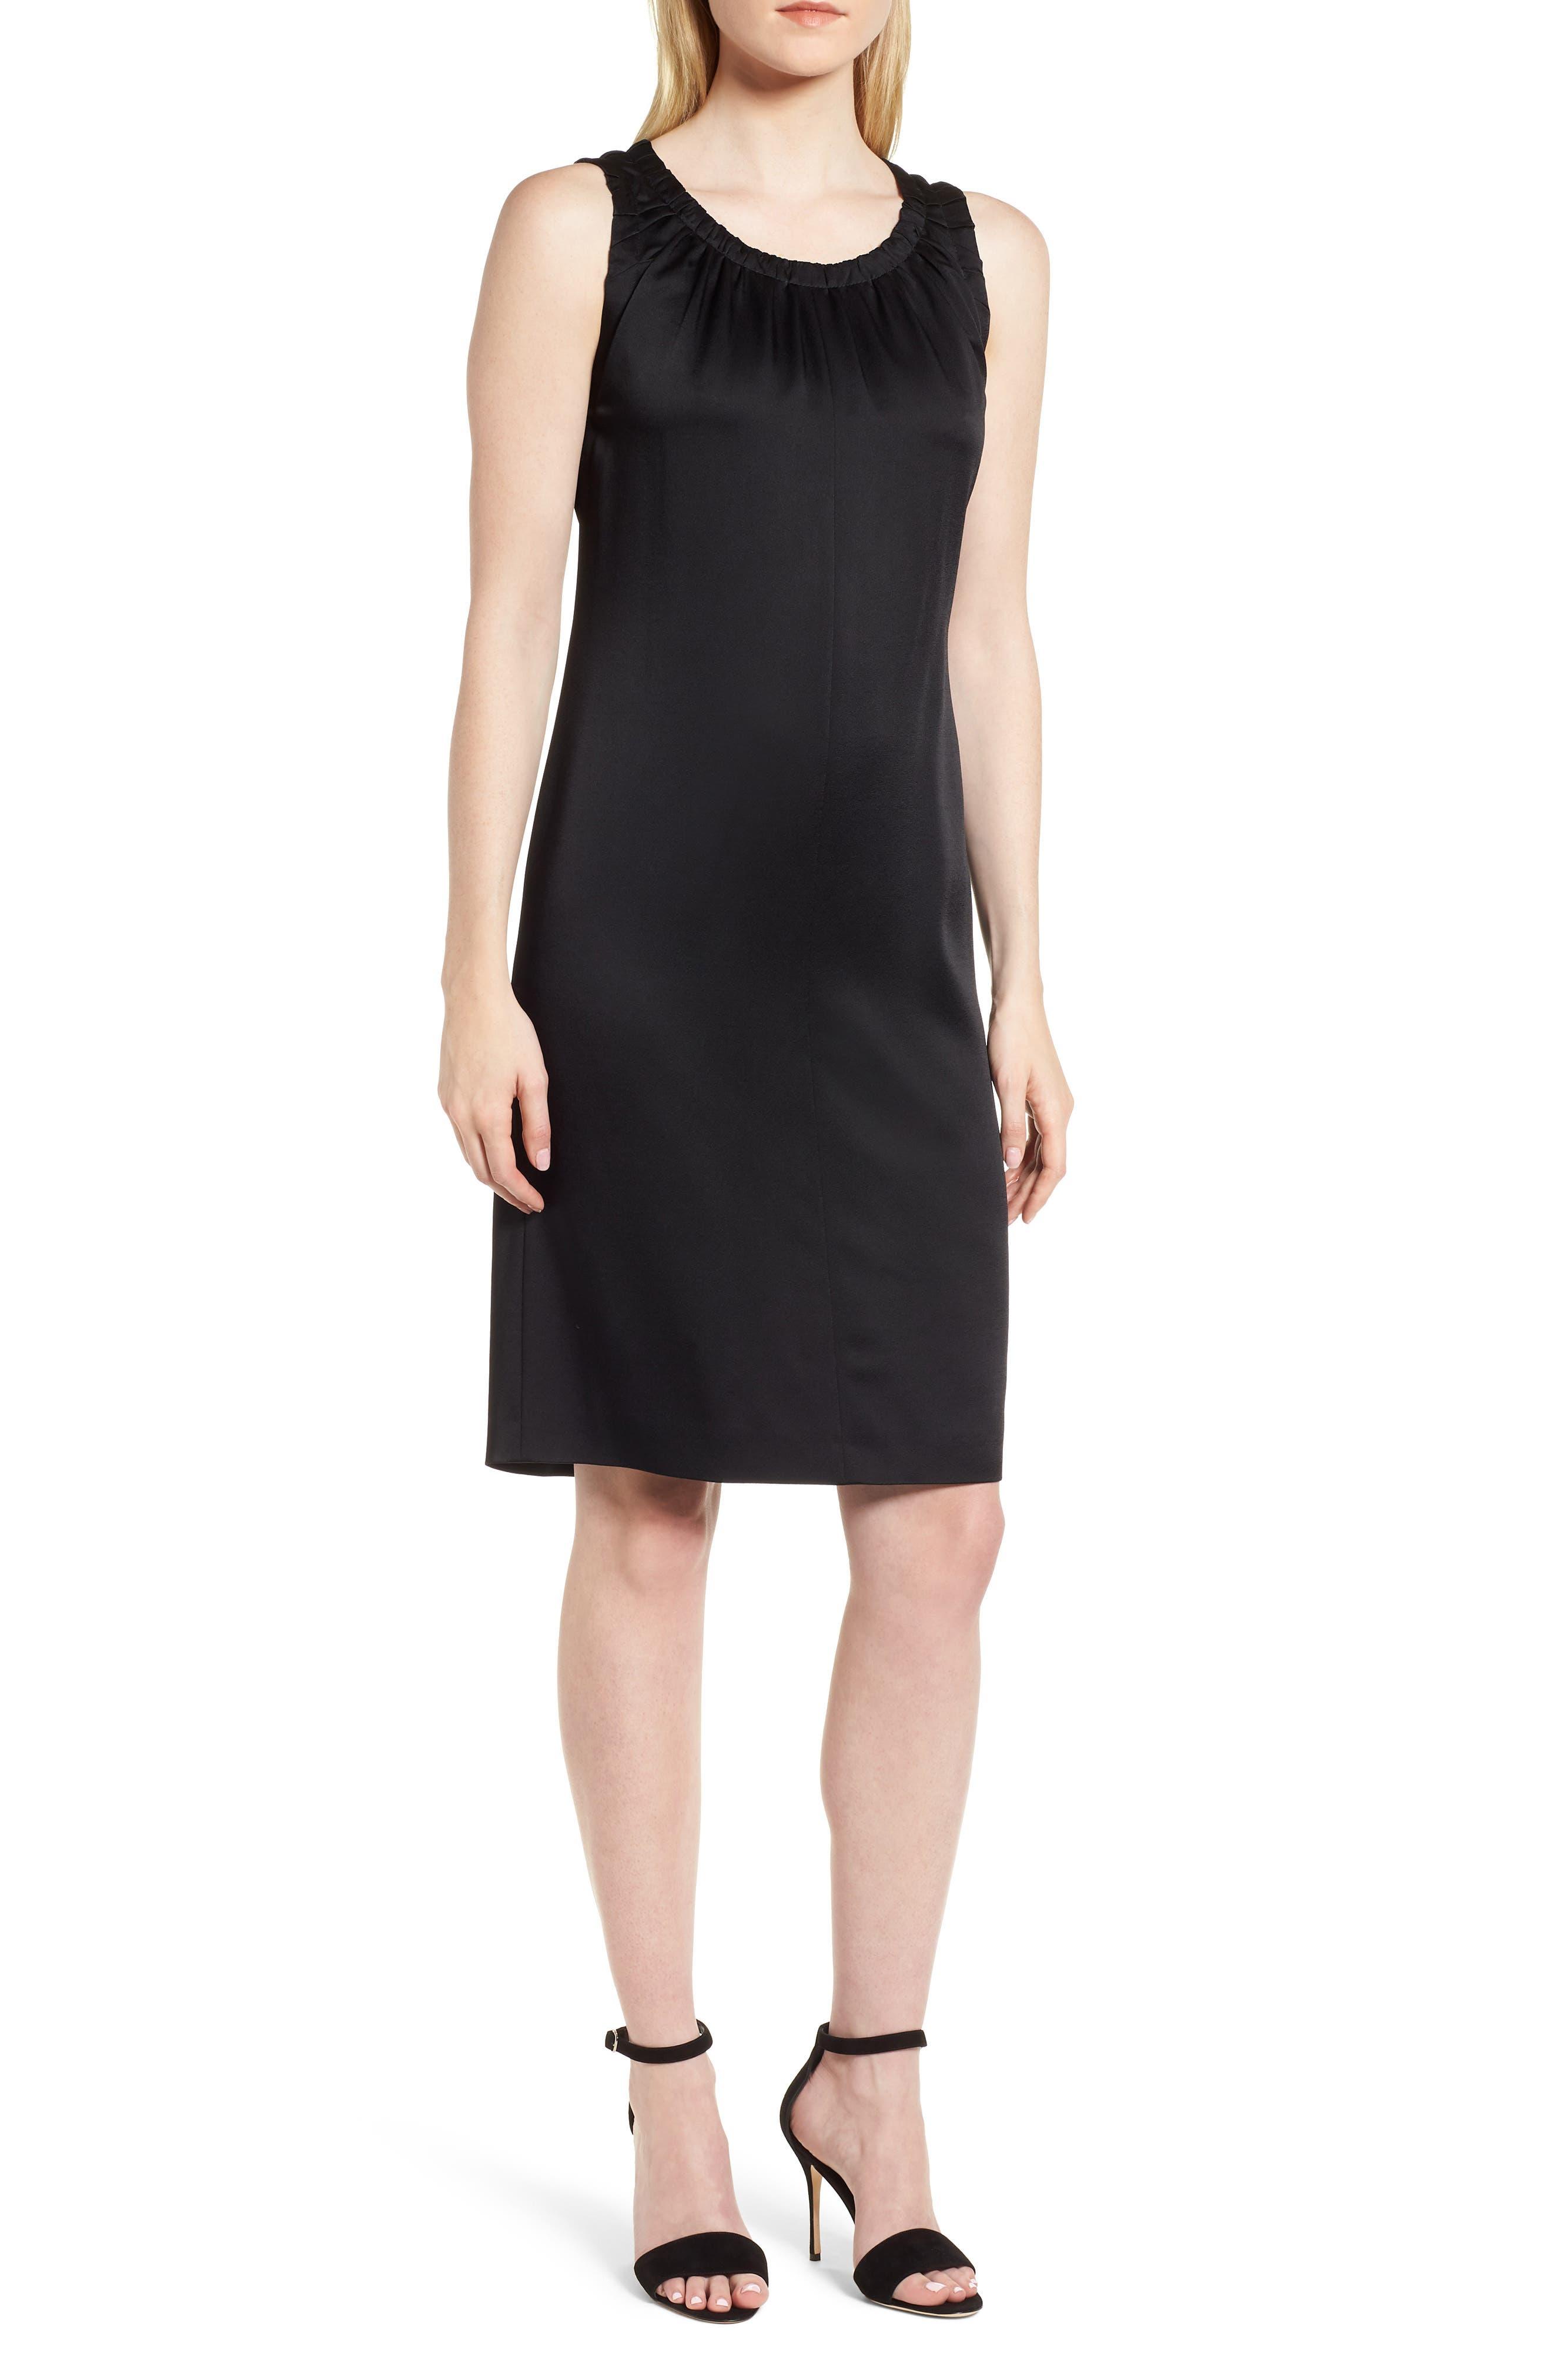 Daviana Sheath Dress,                             Main thumbnail 1, color,                             Black